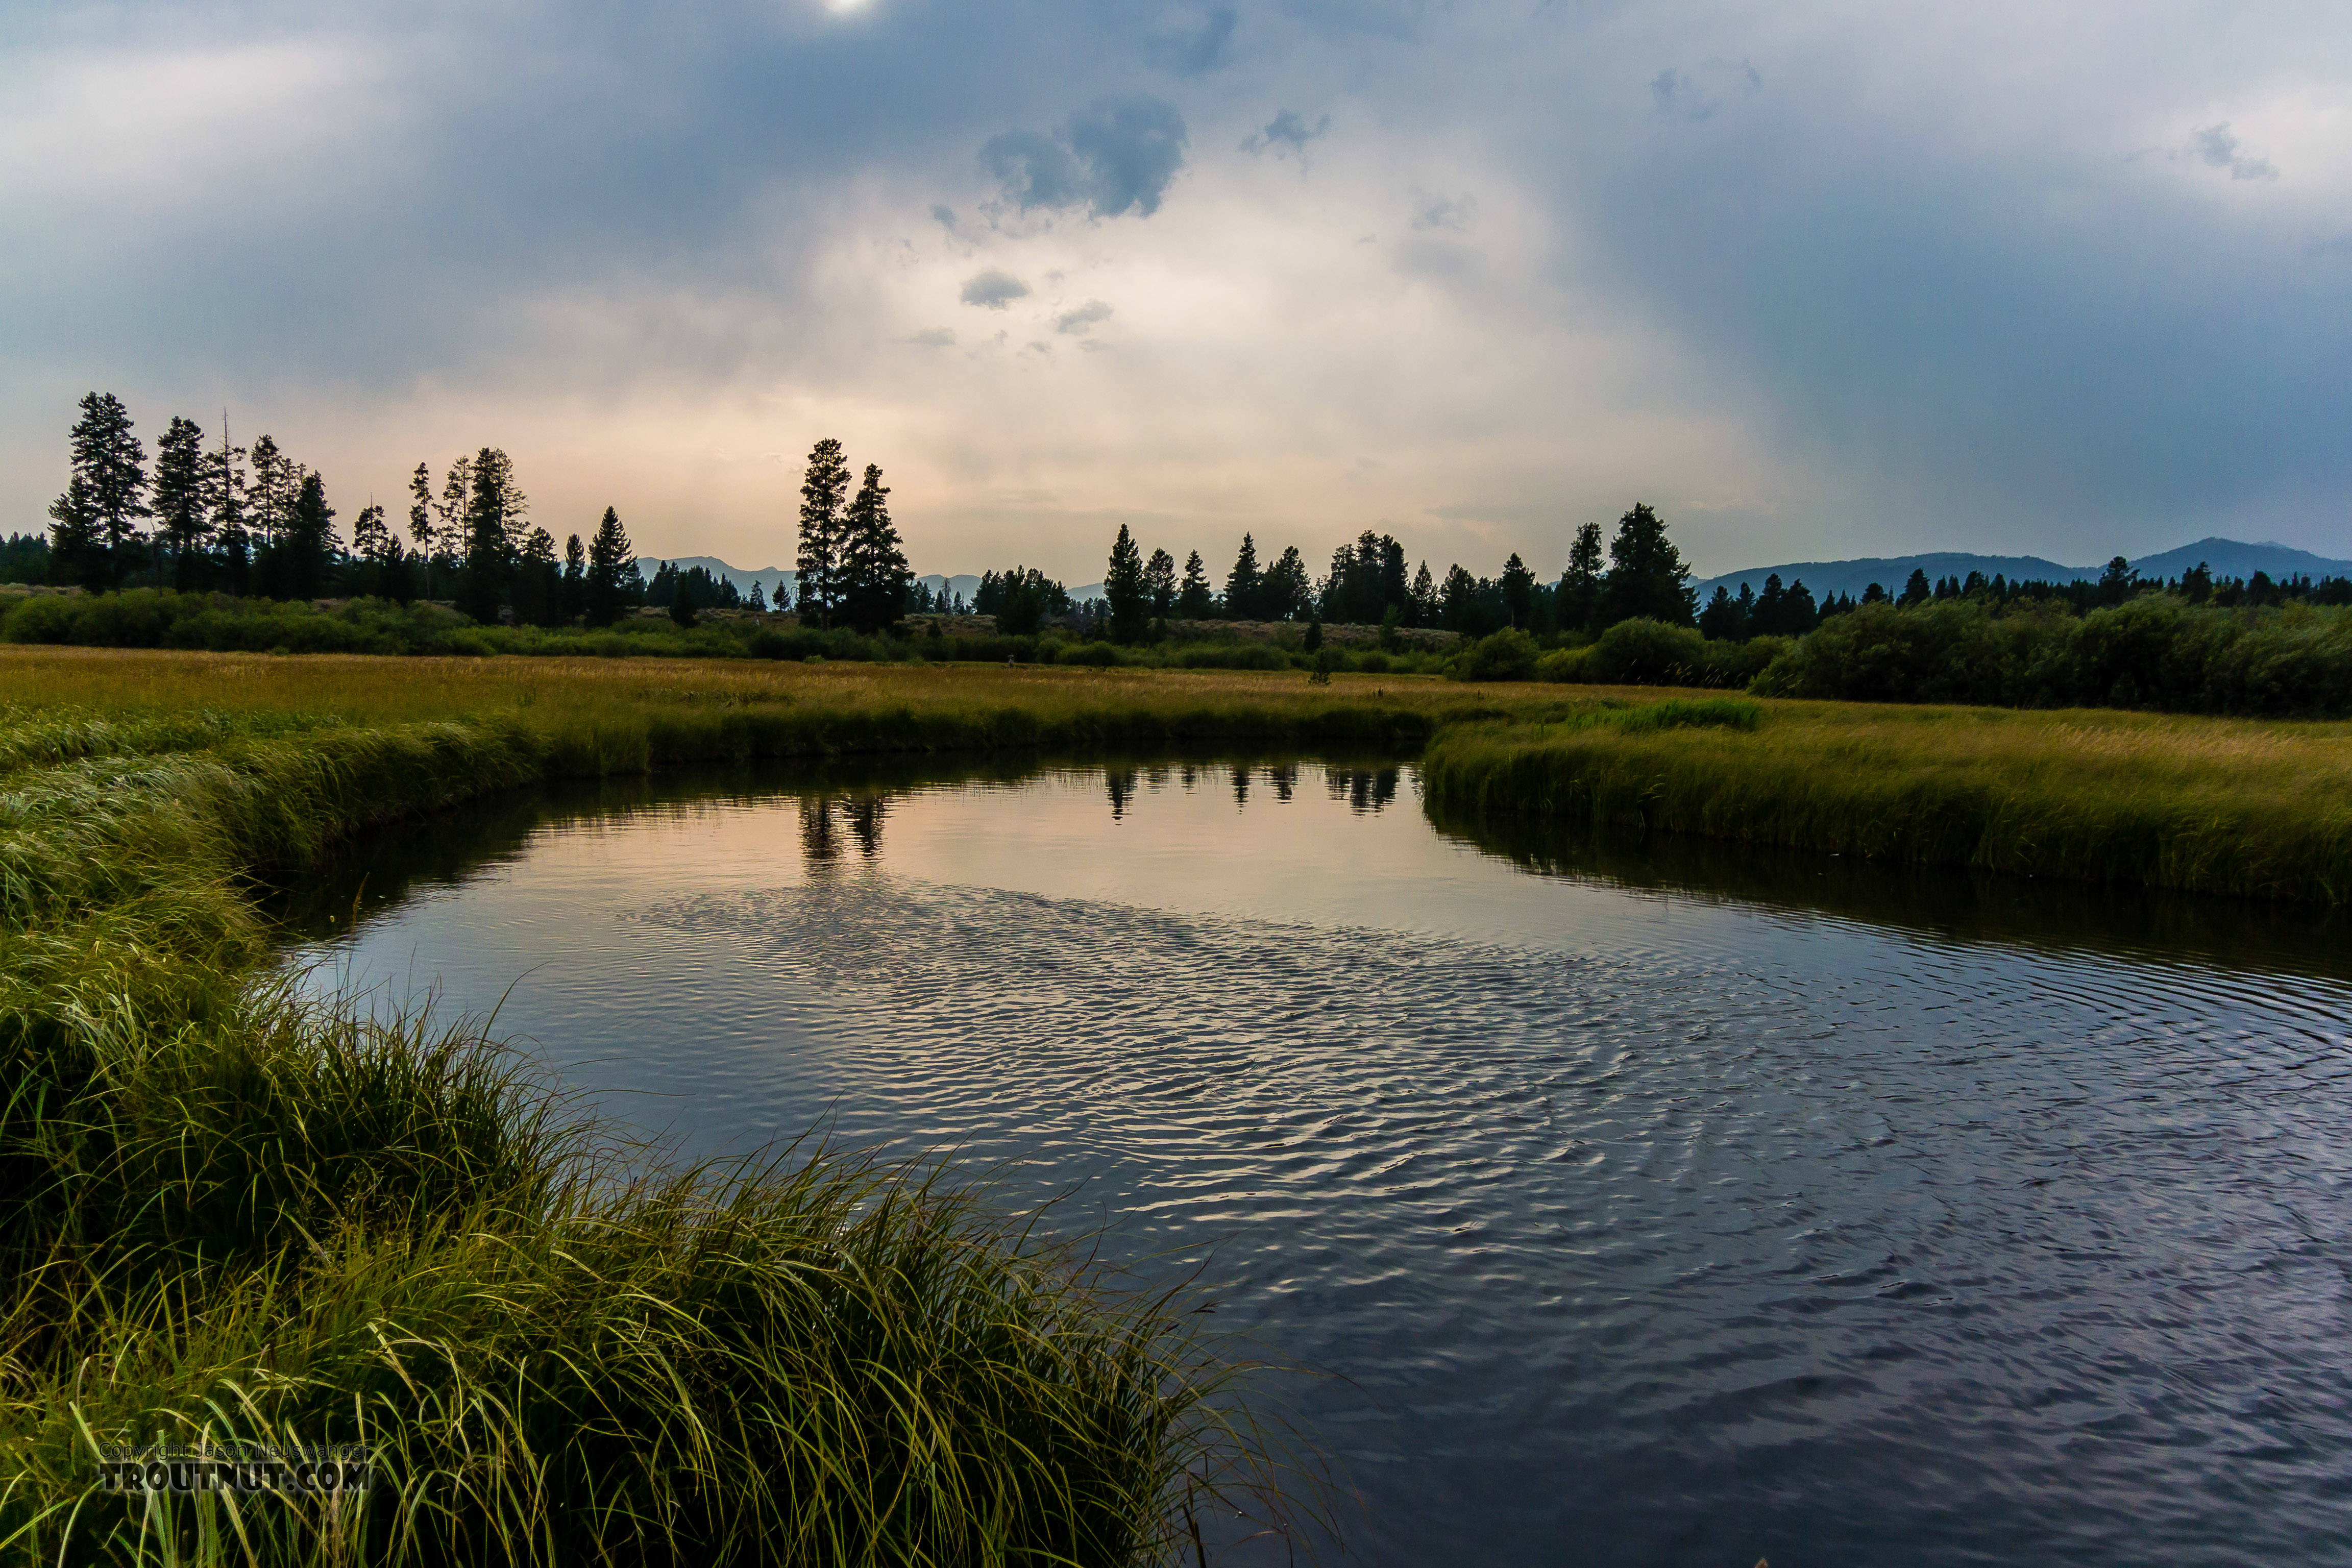 From Duck Creek in Montana.